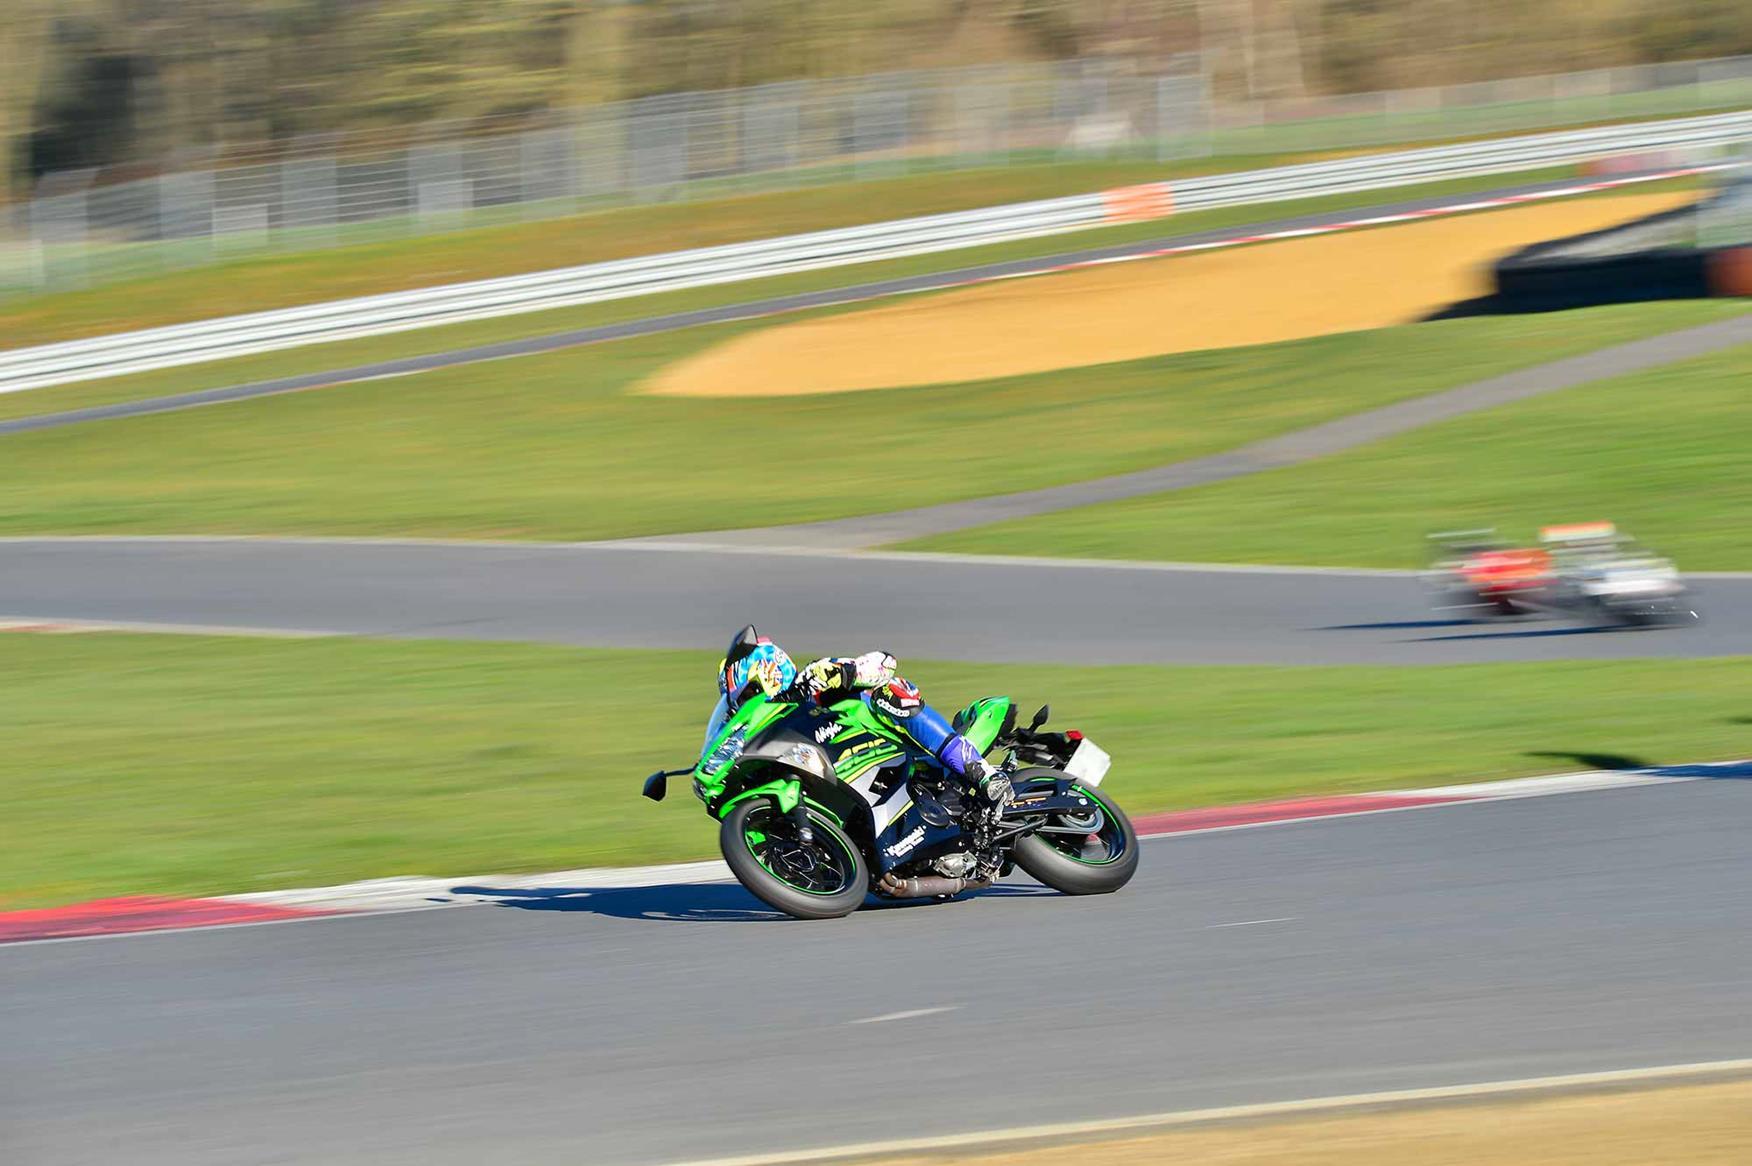 Riding Clearways on the Kawasaki Ninja 400